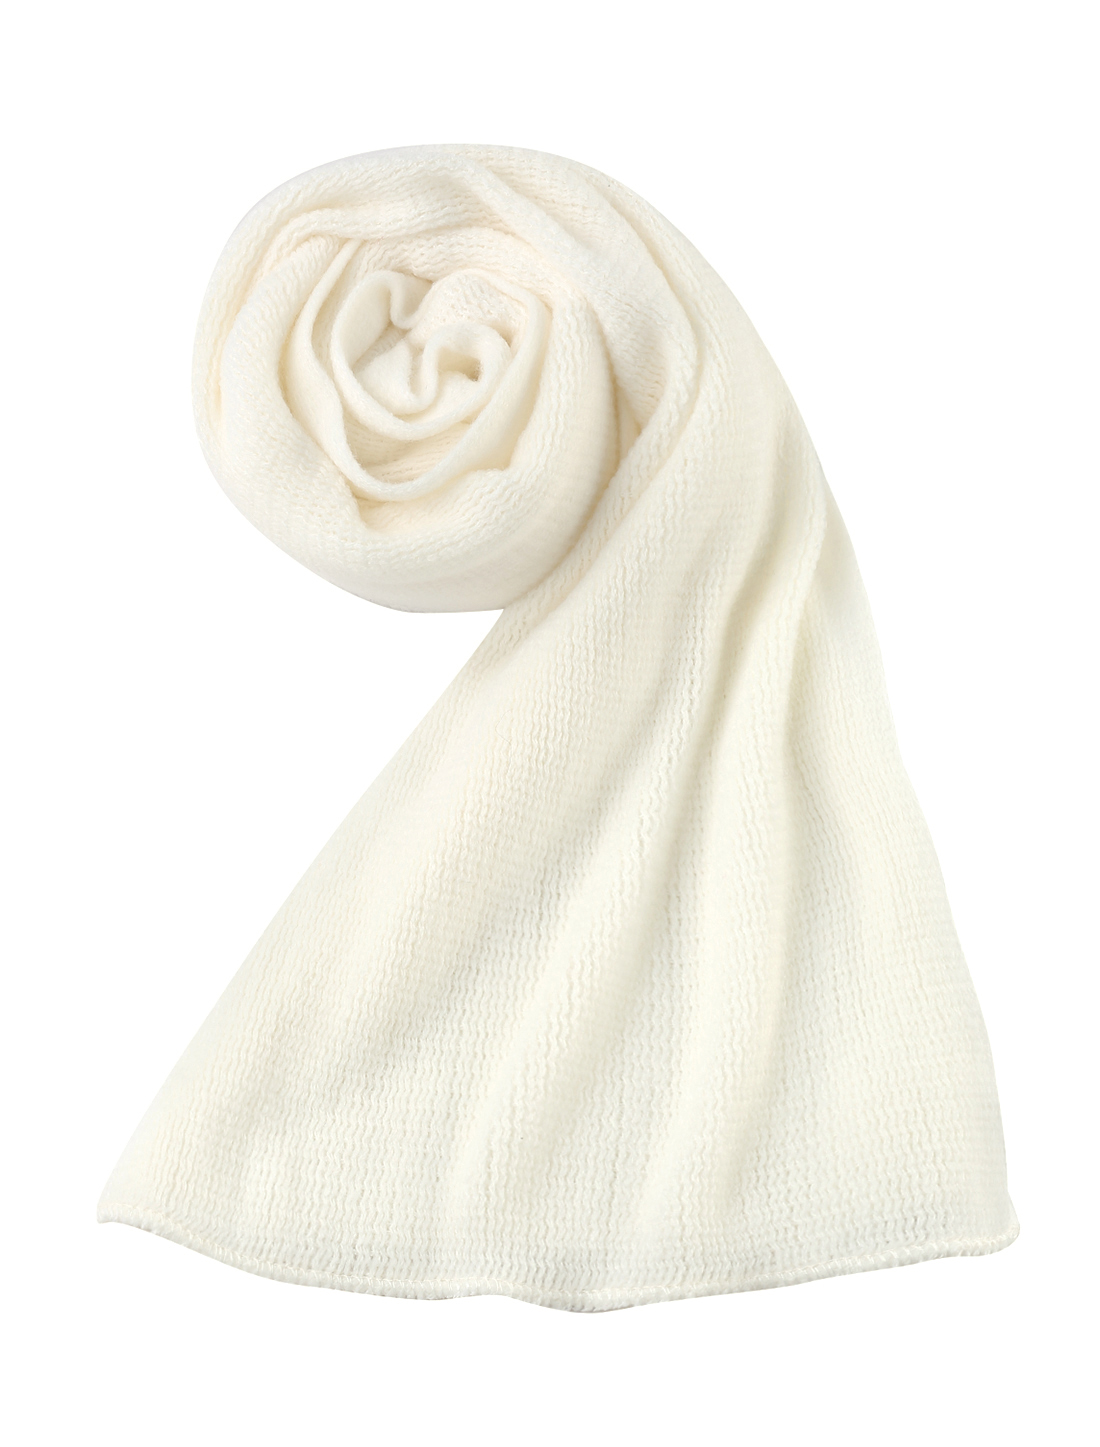 Unisex White Fashion Solid Color Simple Style Warm 208cm x30cm Neckerchief